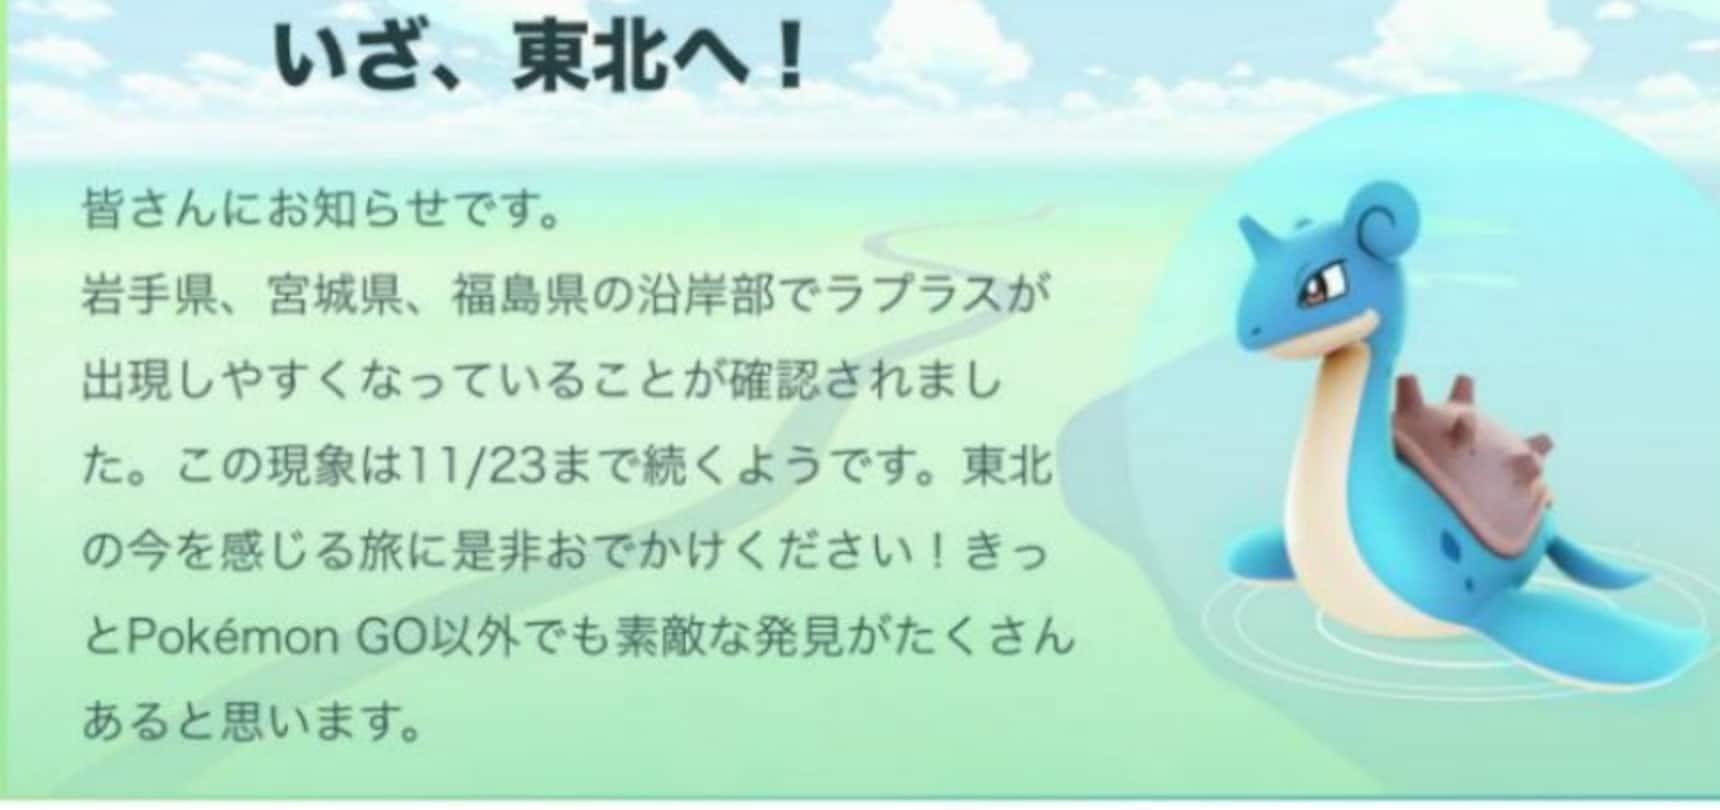 'Pokémon GO' to Tohoku to Catch Rare Pokémon